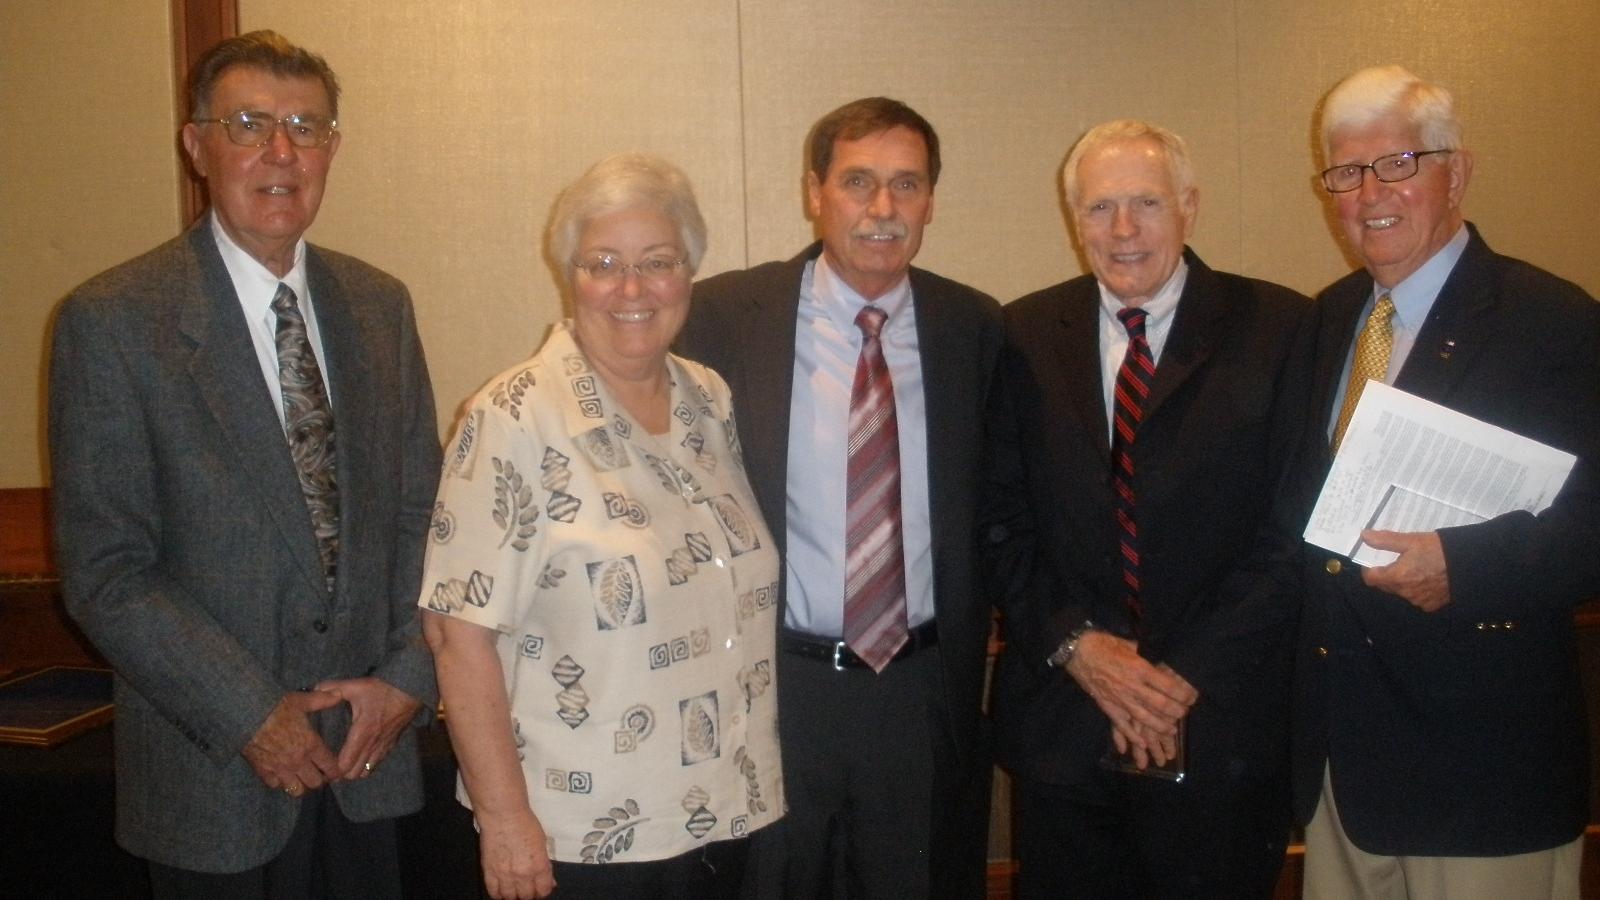 Collegiate Coaching legends - nort thornton, Jean freeman, gregg troy, ernie Maglischo & peter daland